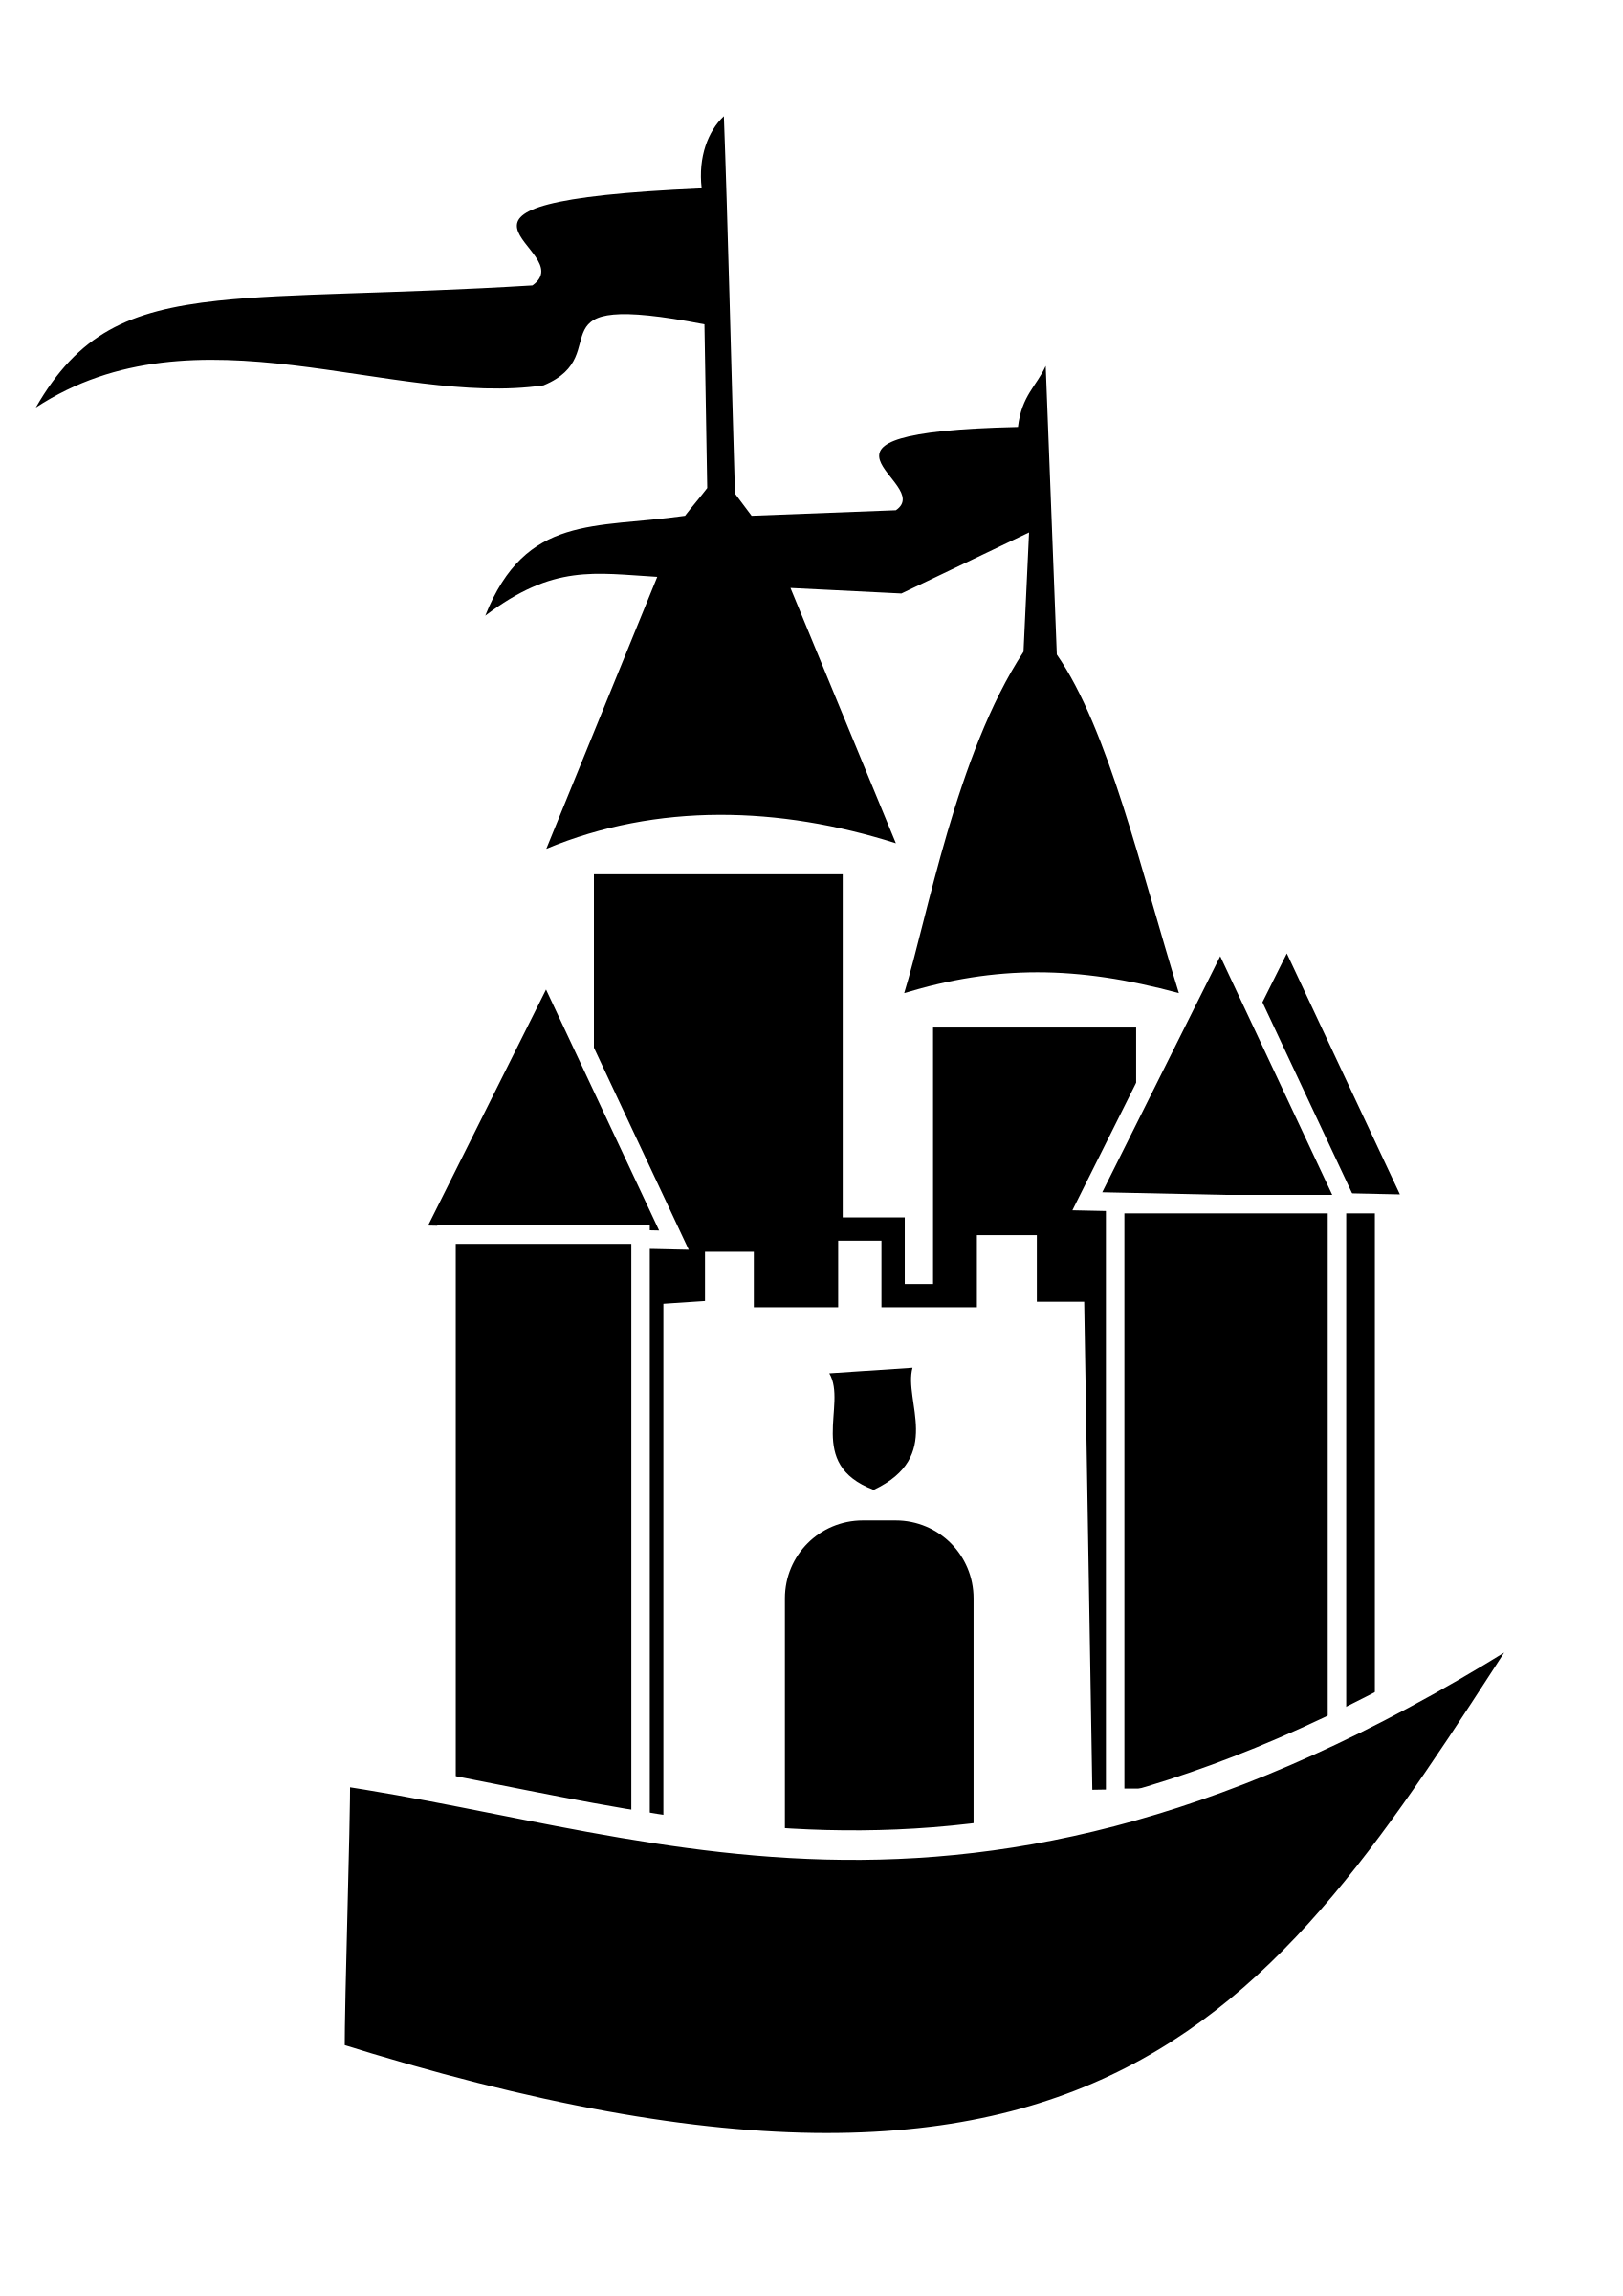 castle of time vector clipart image free stock photo public rh goodfreephotos com castle victorian nebraska castle victorian home plans